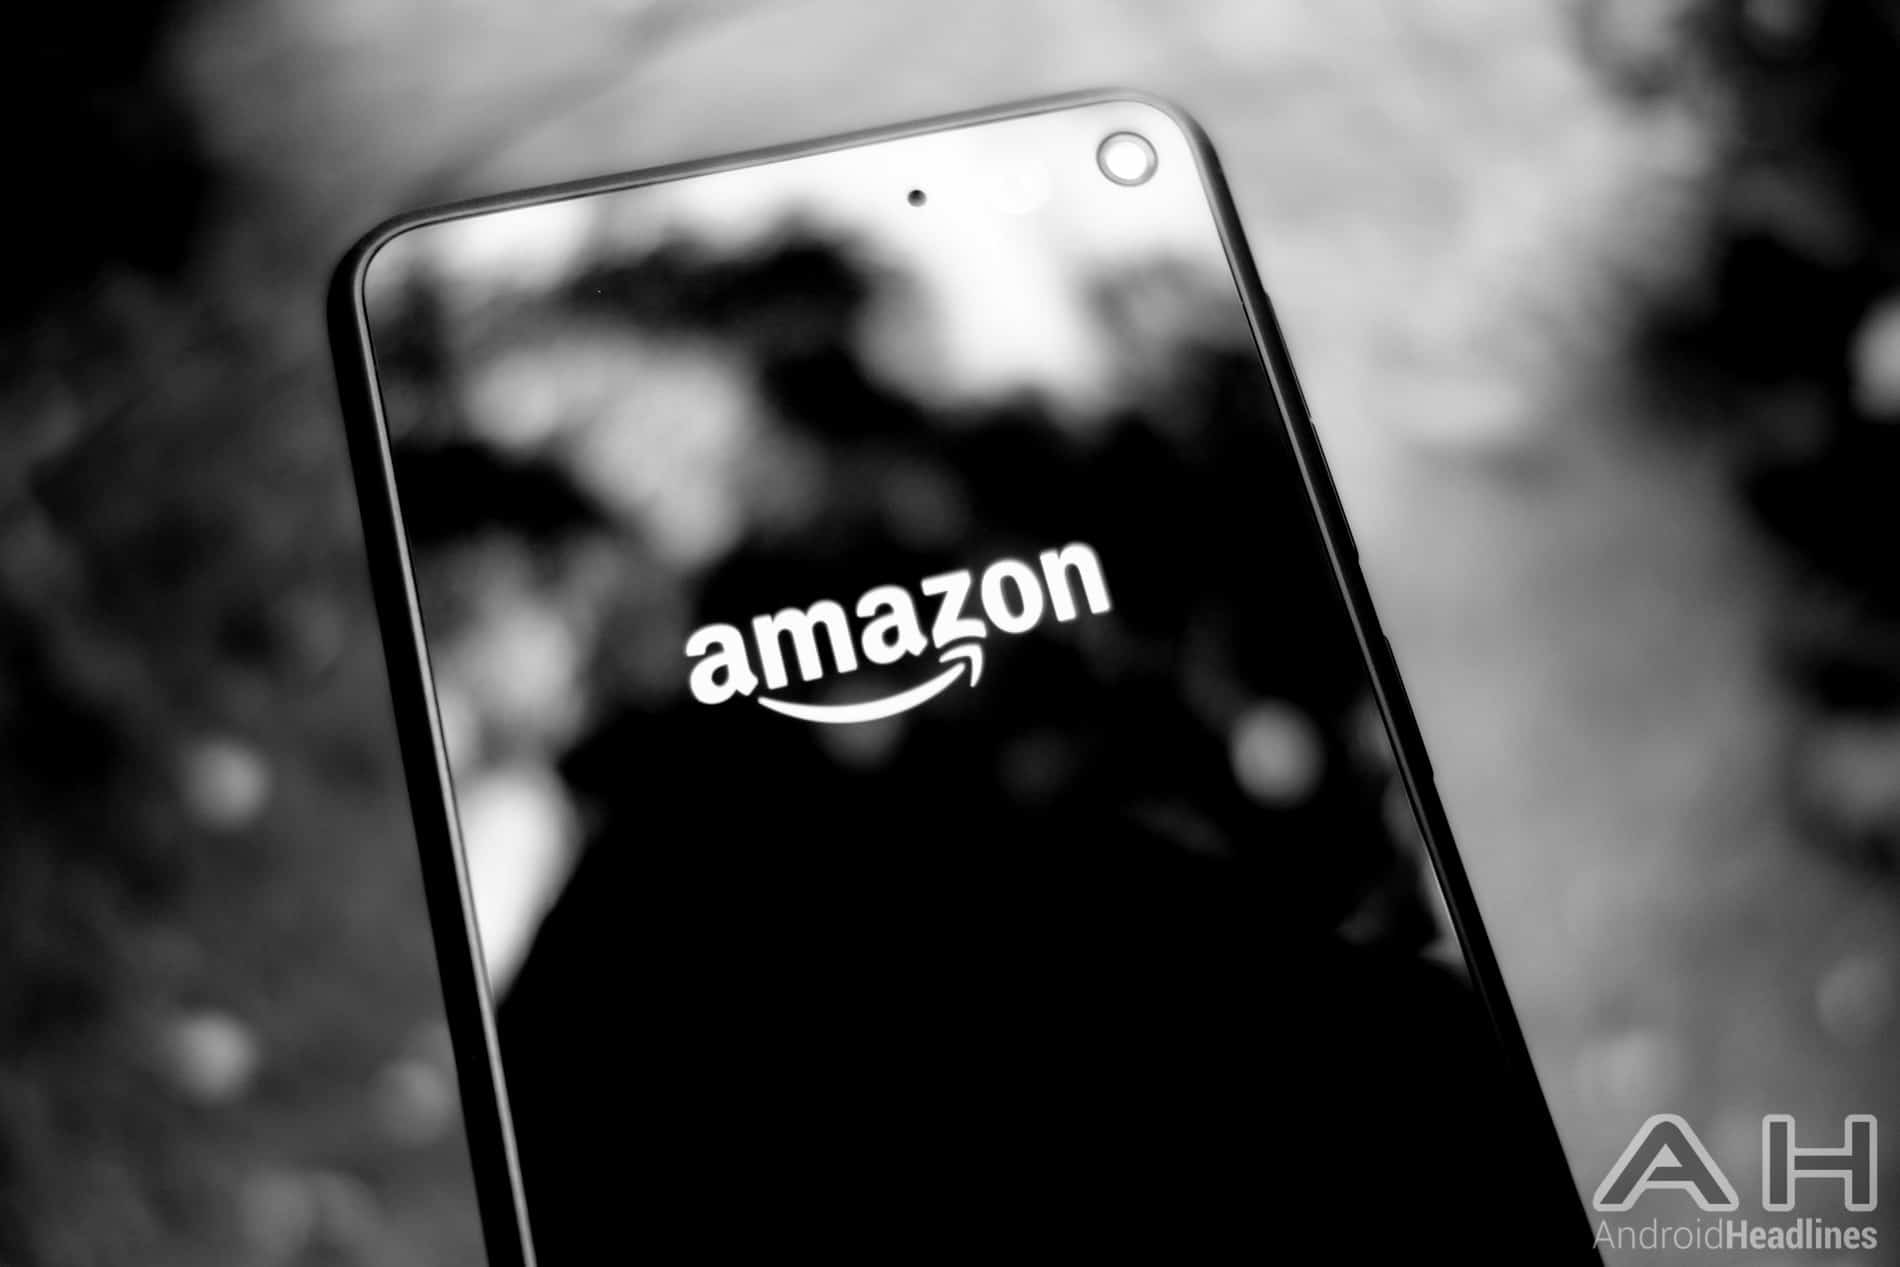 Amazon Fire Phone AH Headliner 1